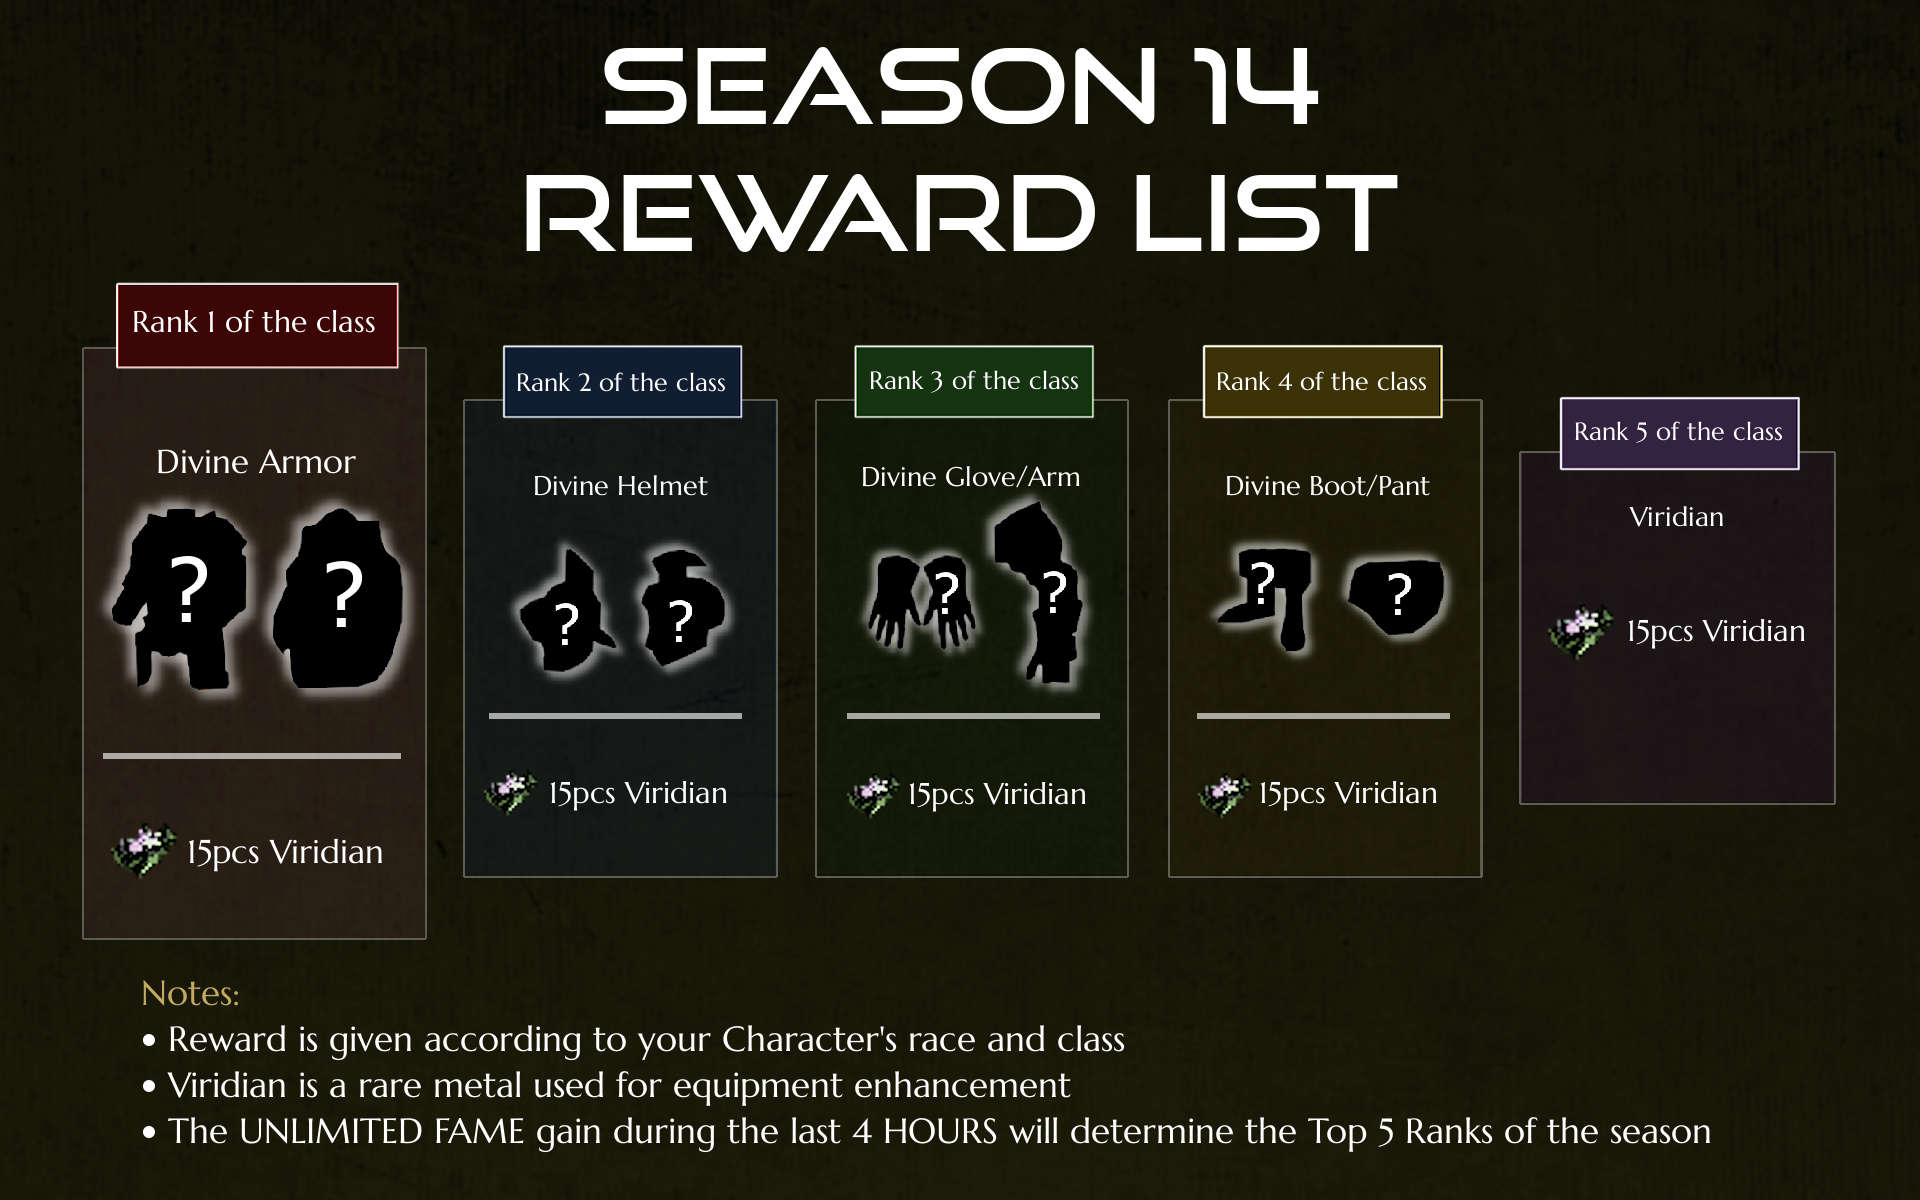 Season 14 Reward List